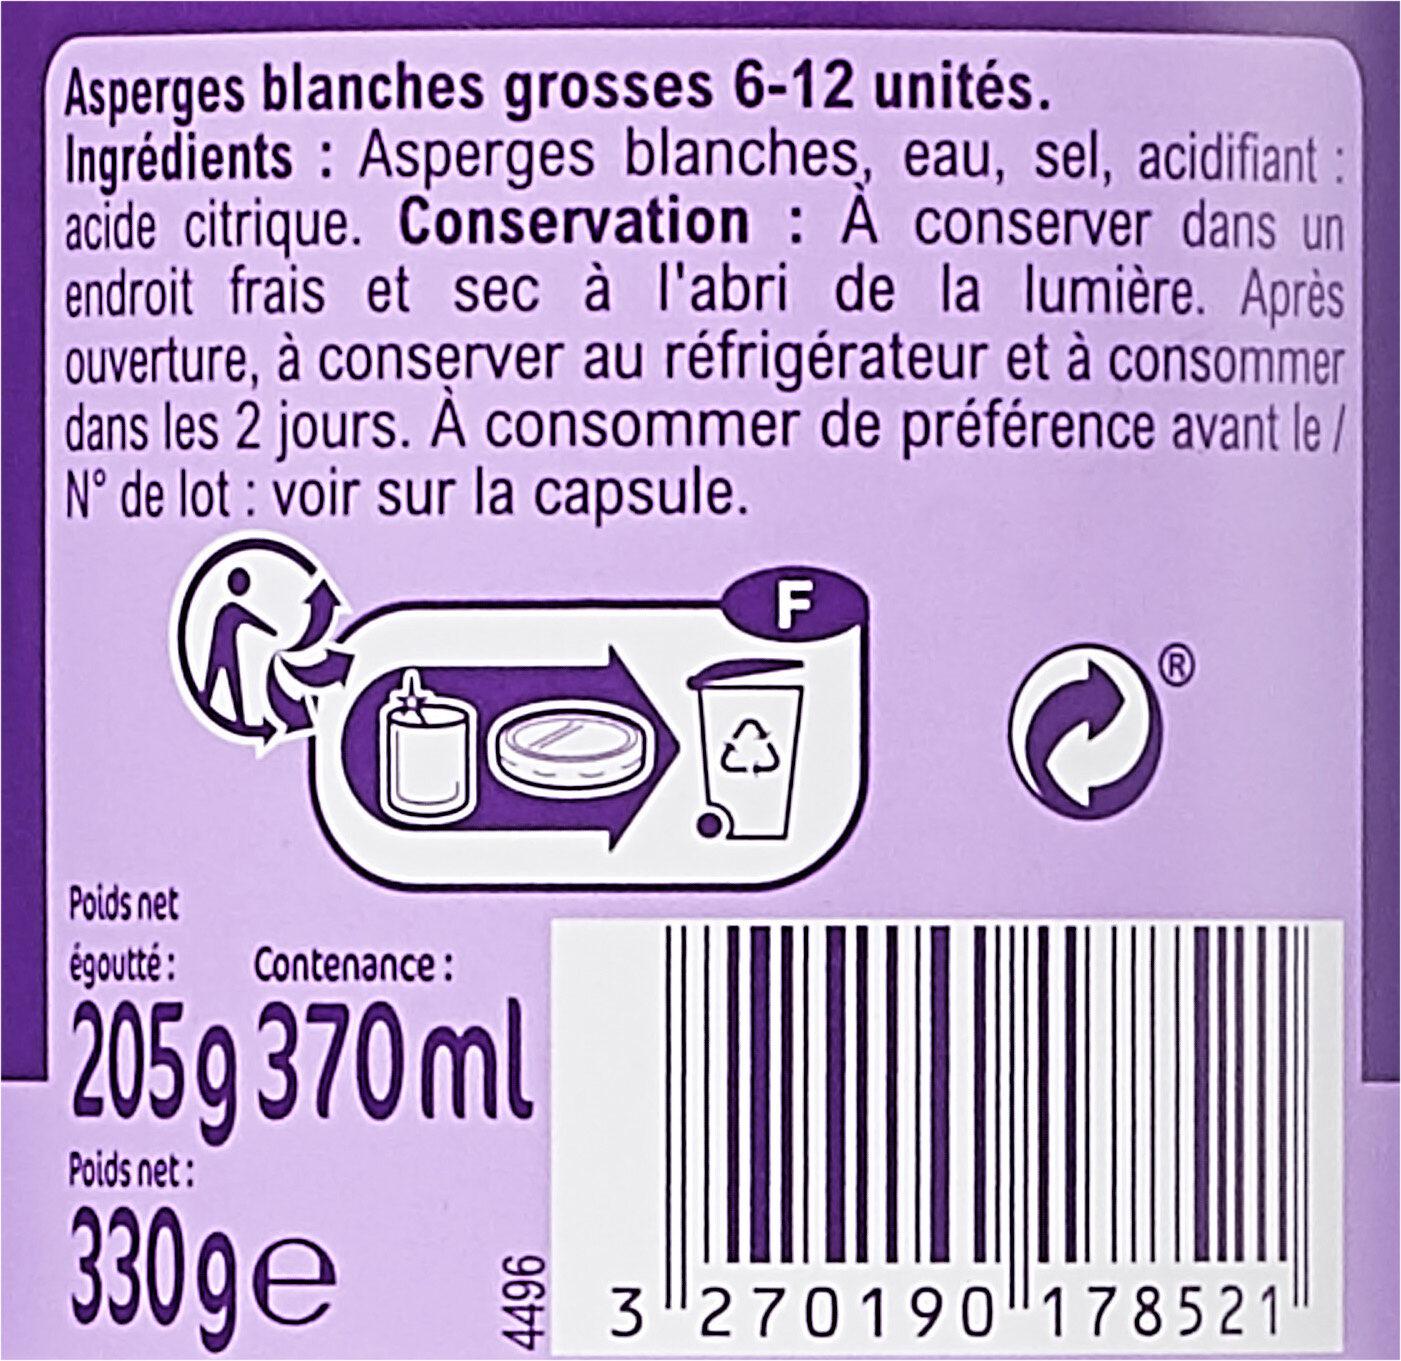 Asperges blanches grosses - Ingrédients - fr